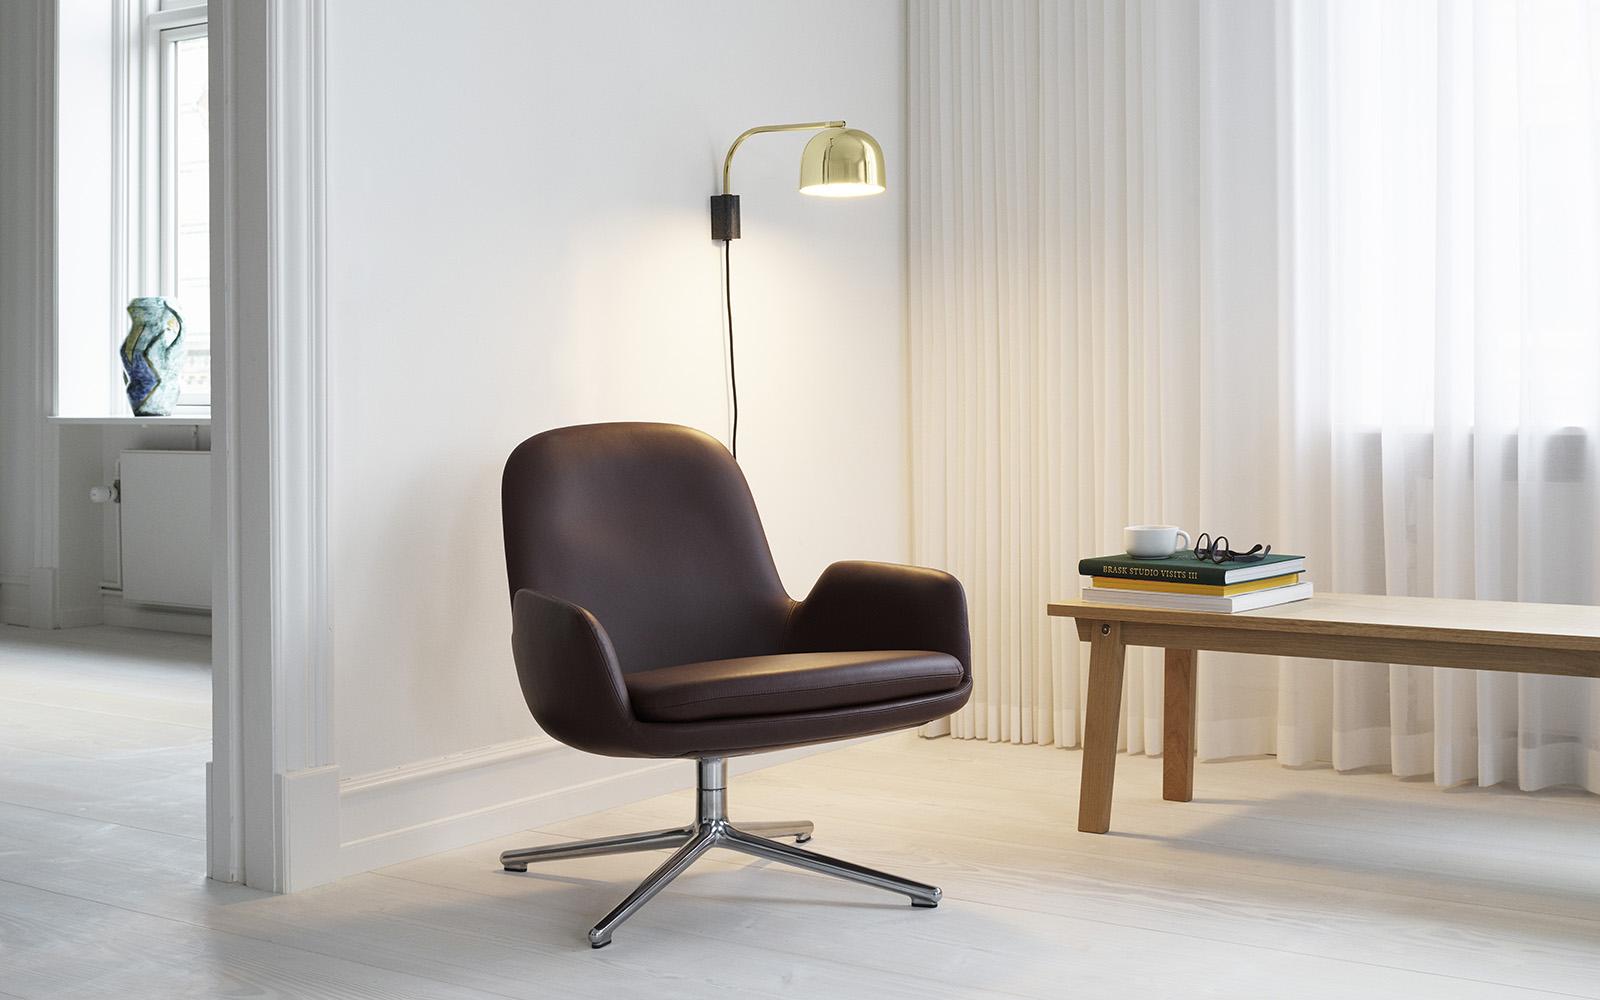 Normann Copenhagen Stoel : Normann copenhagen outlet form armchair stoel met eiken